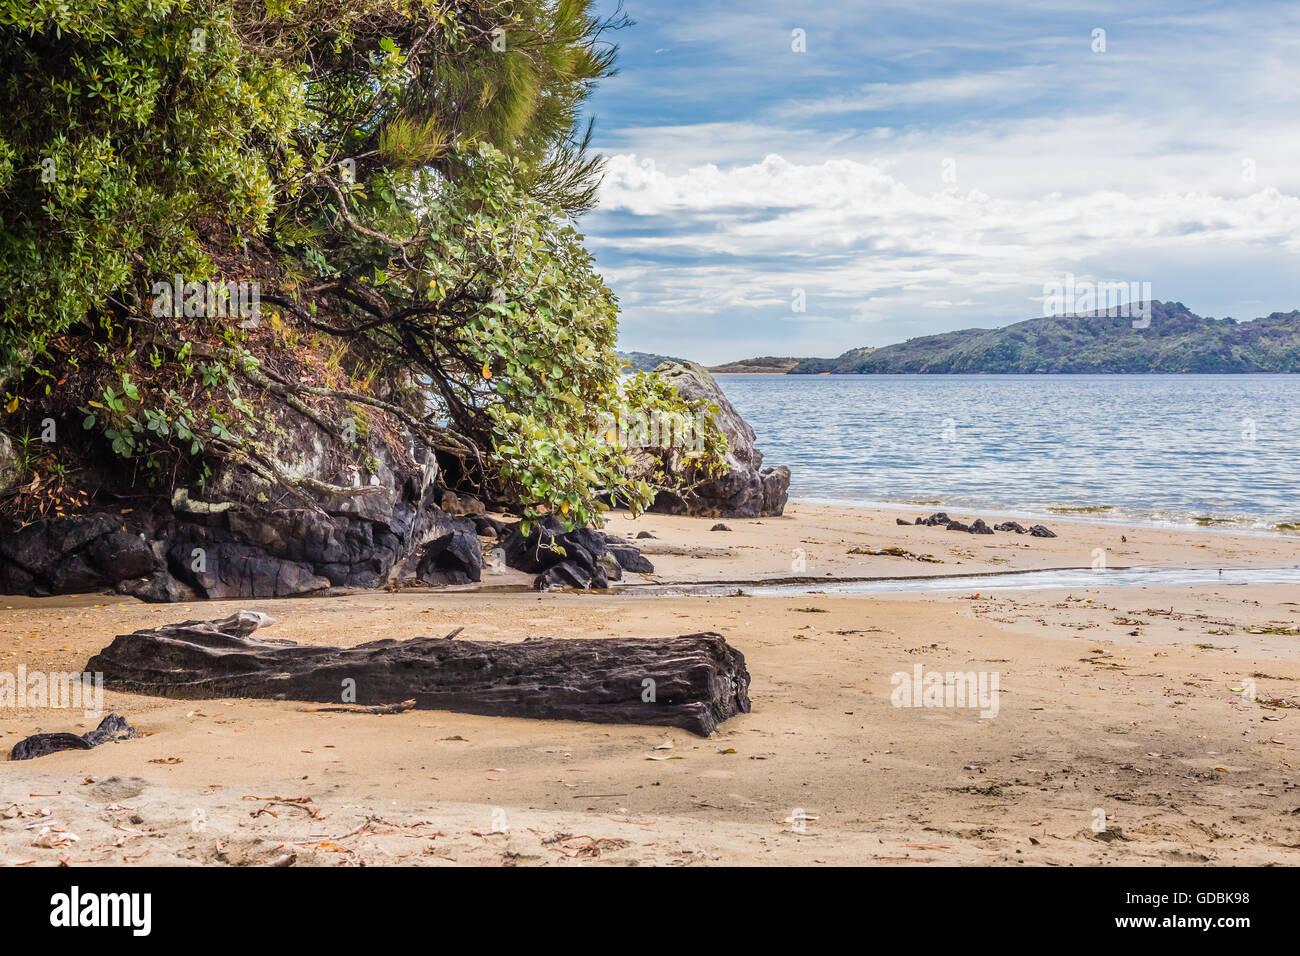 Sydney Cove Beach, Ulva Island, New Zealand - Stock Image